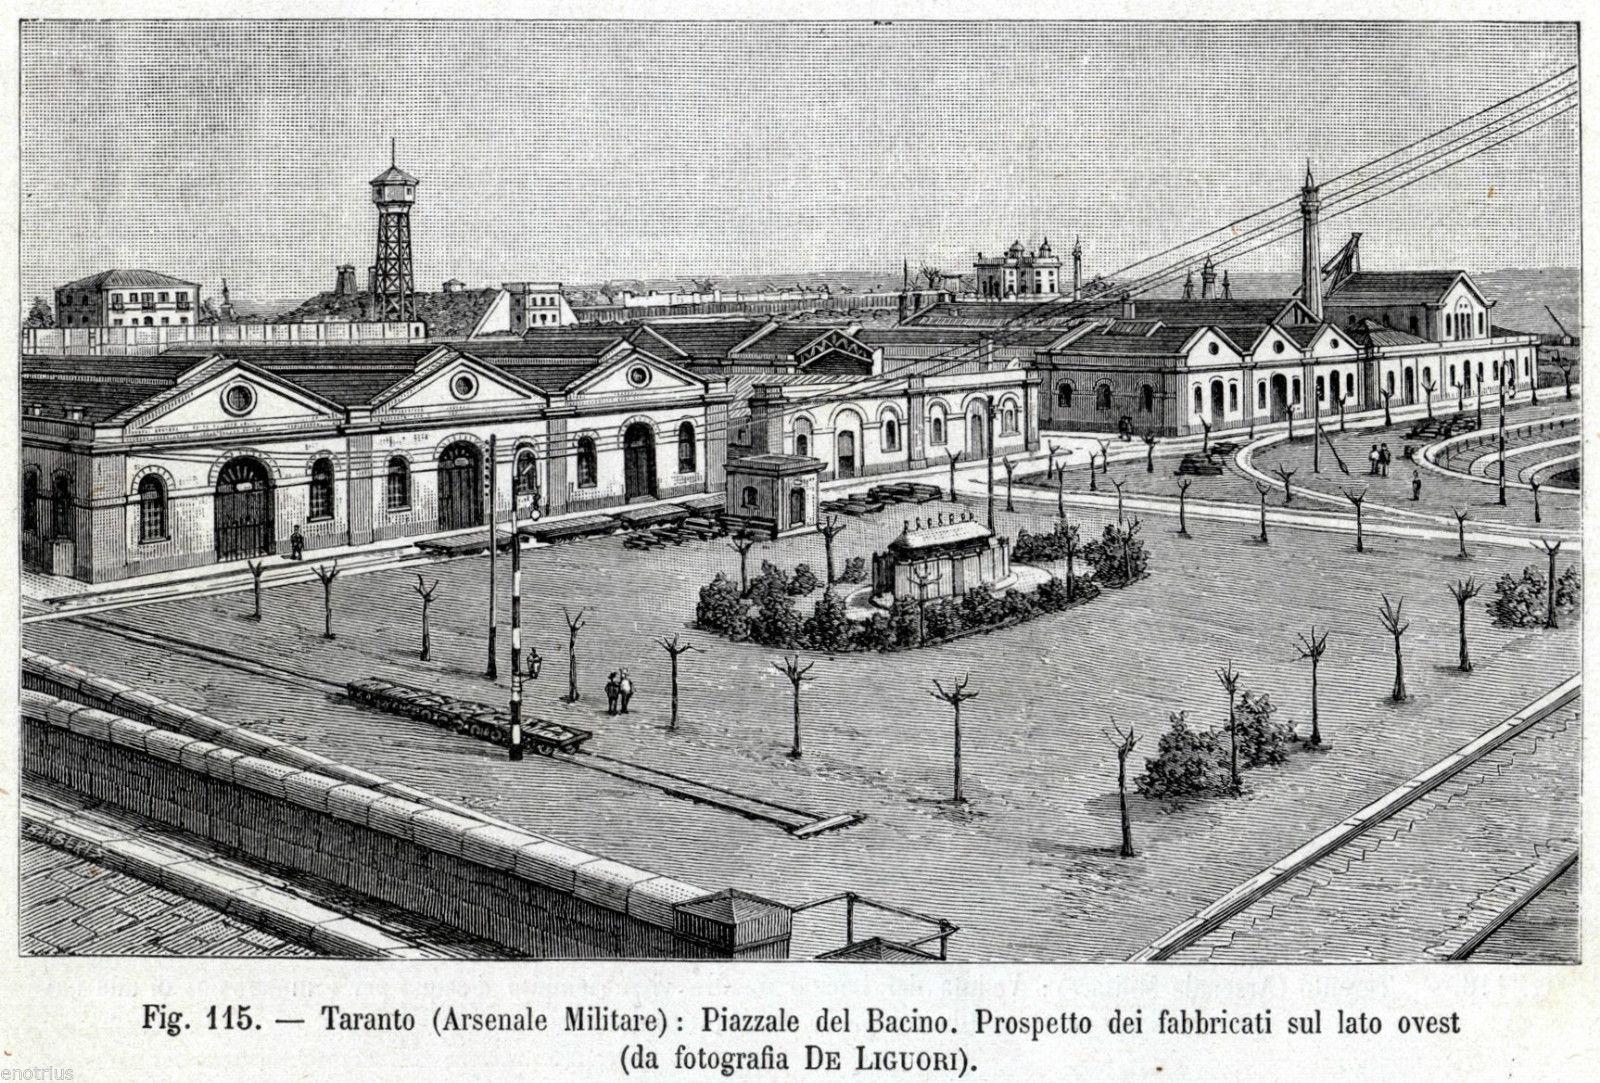 0127 Arsenale M.M.-Piazz.del Bacino-1899